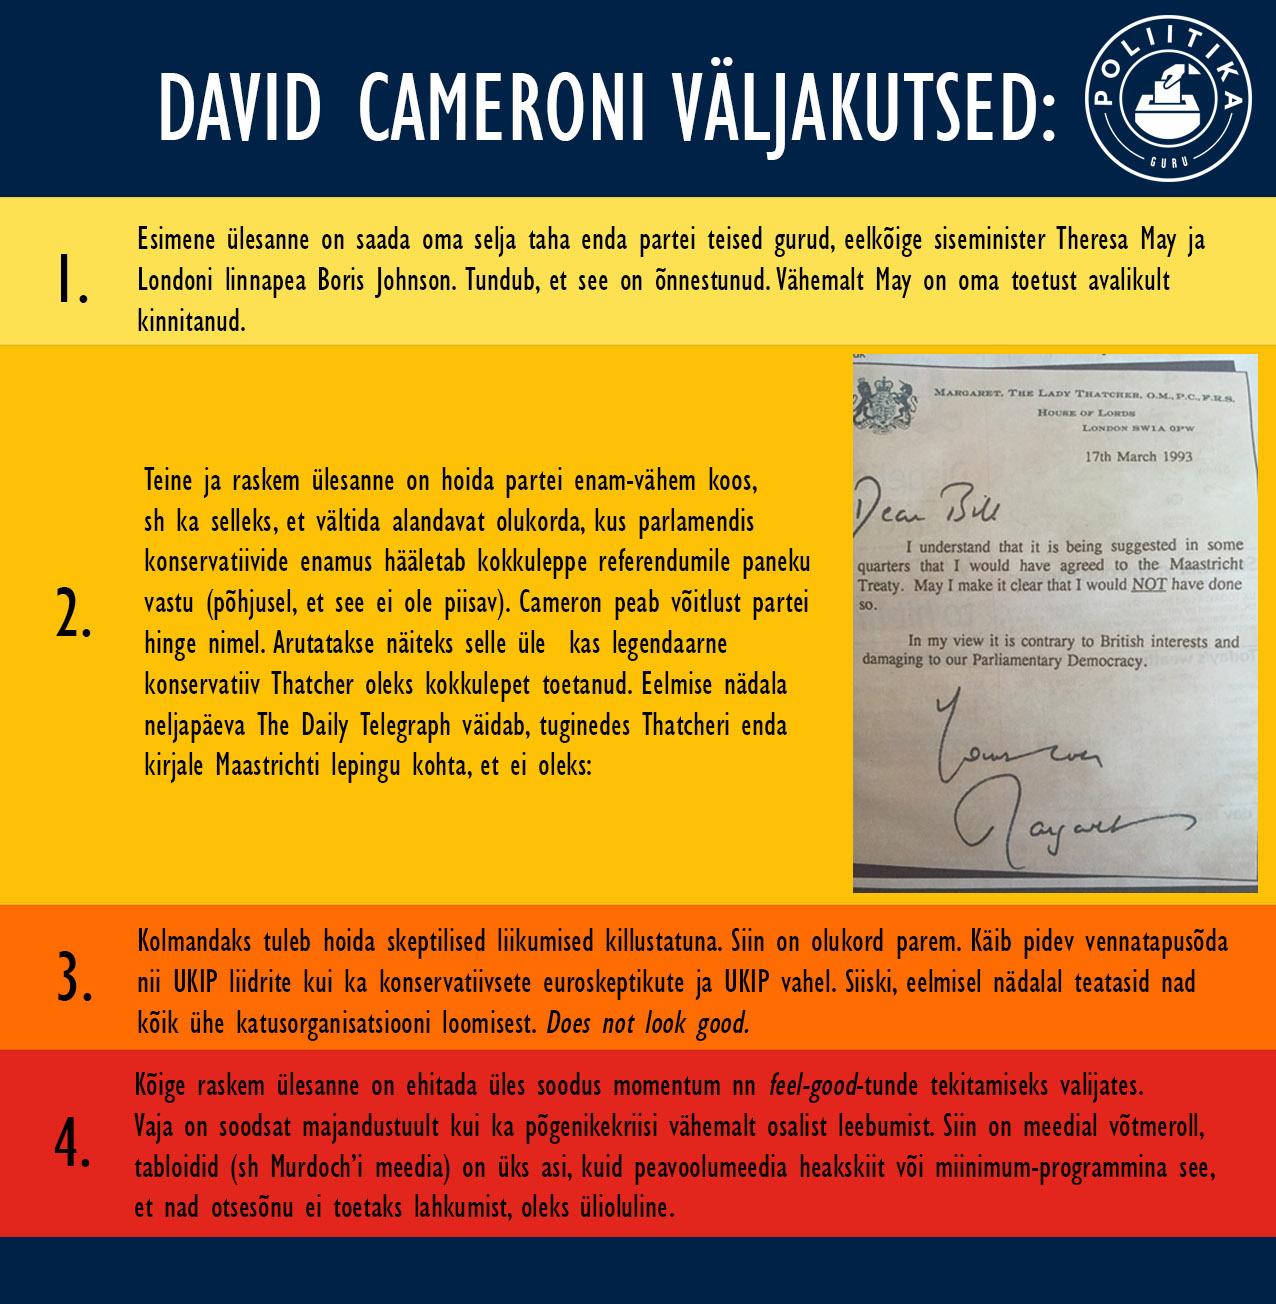 David Cameroni riskid